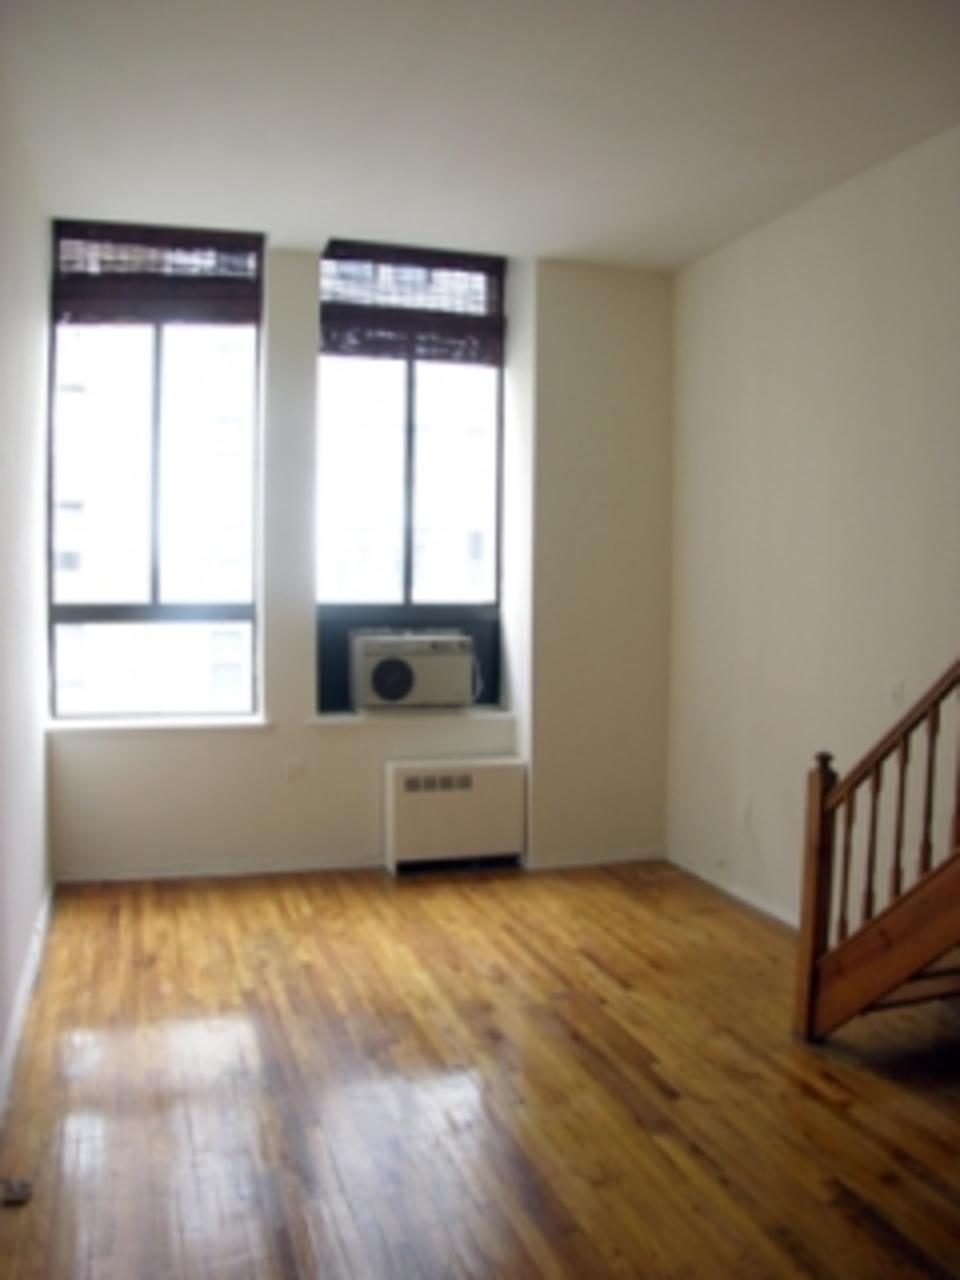 295 Park Avenue South Living Room - Gramercy Park Rental Apartments